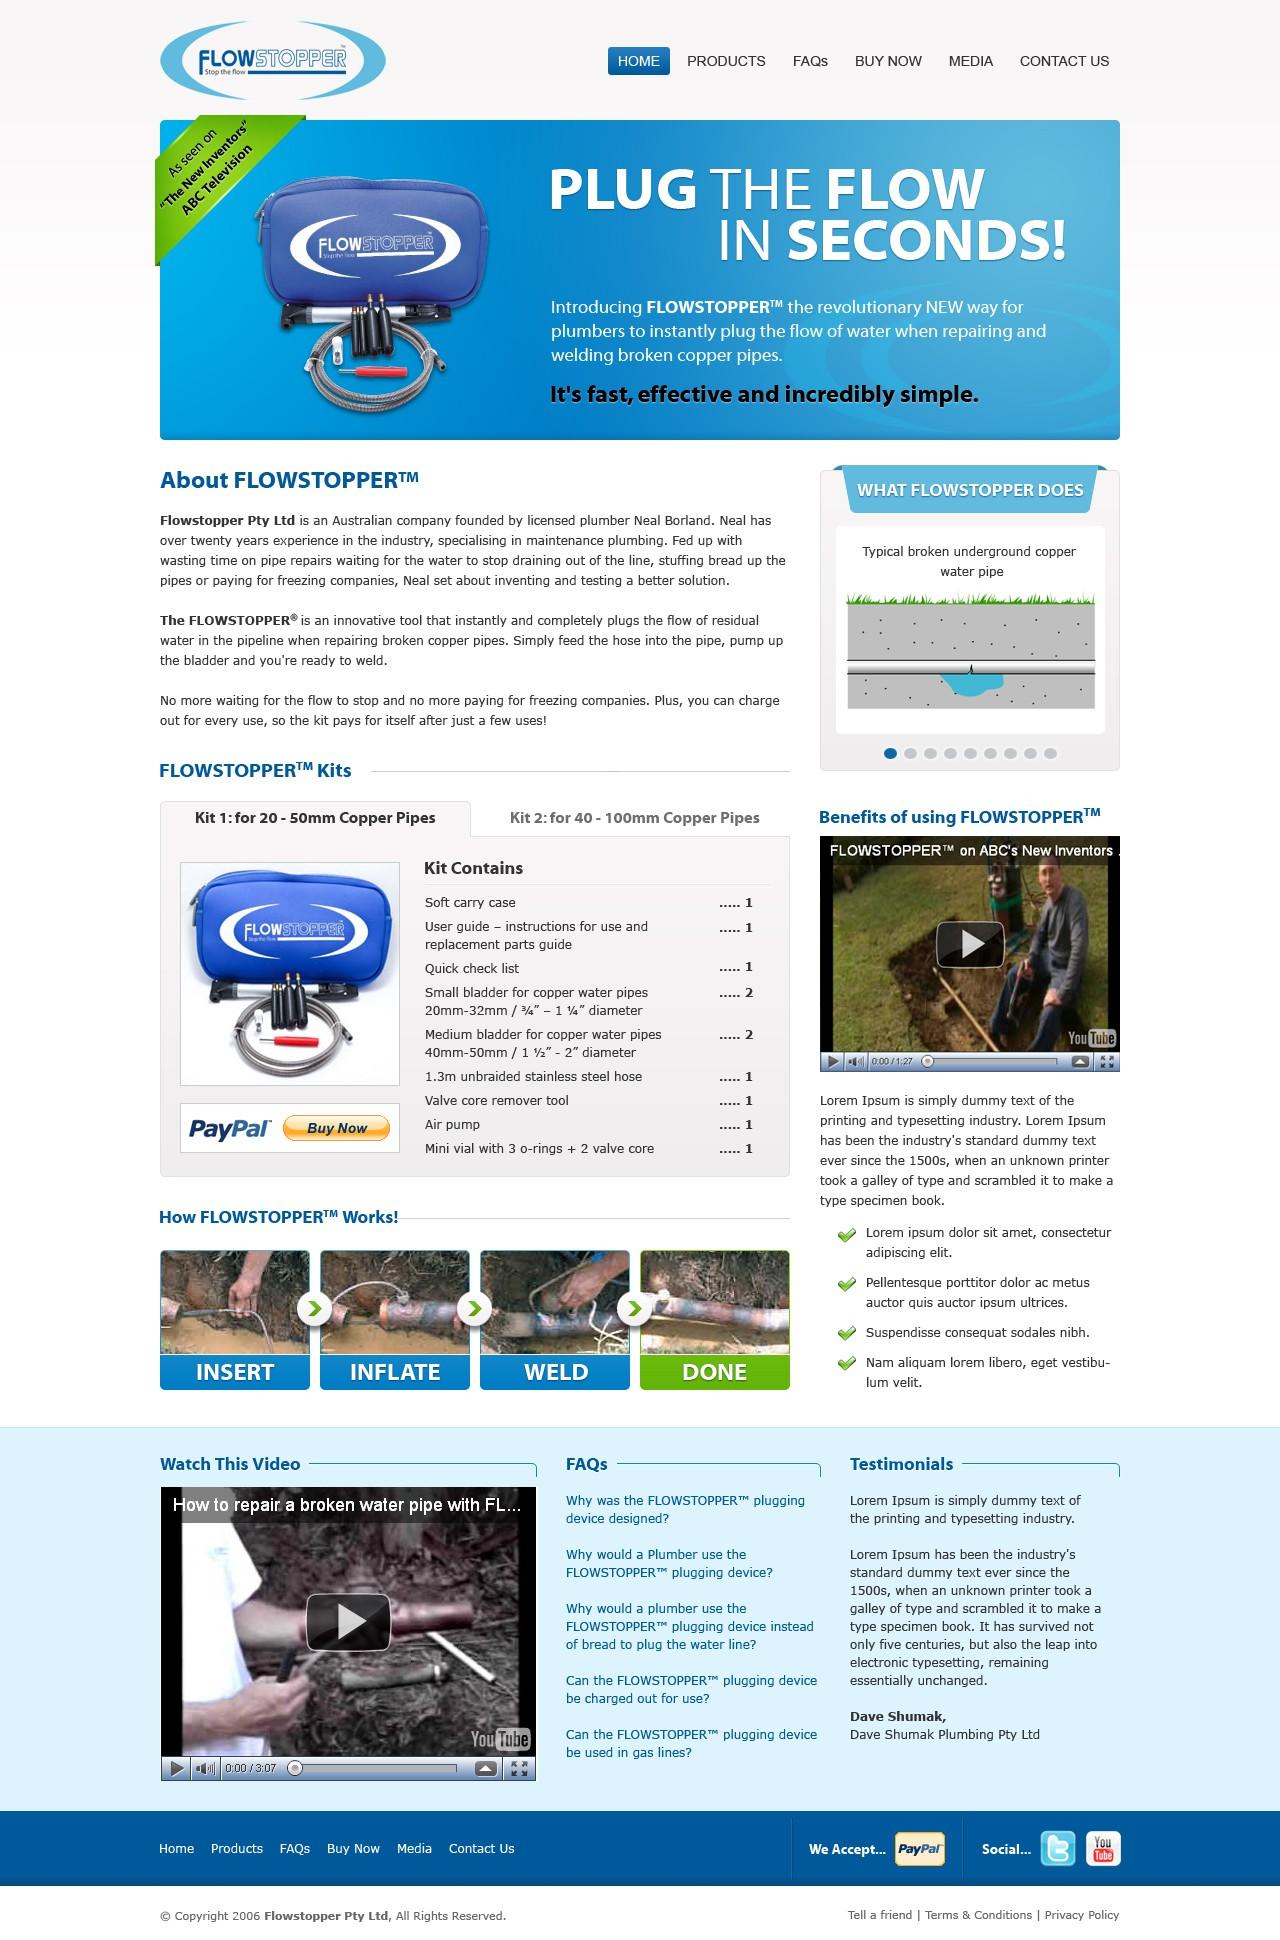 Flowstopper - needs a new website / redesign